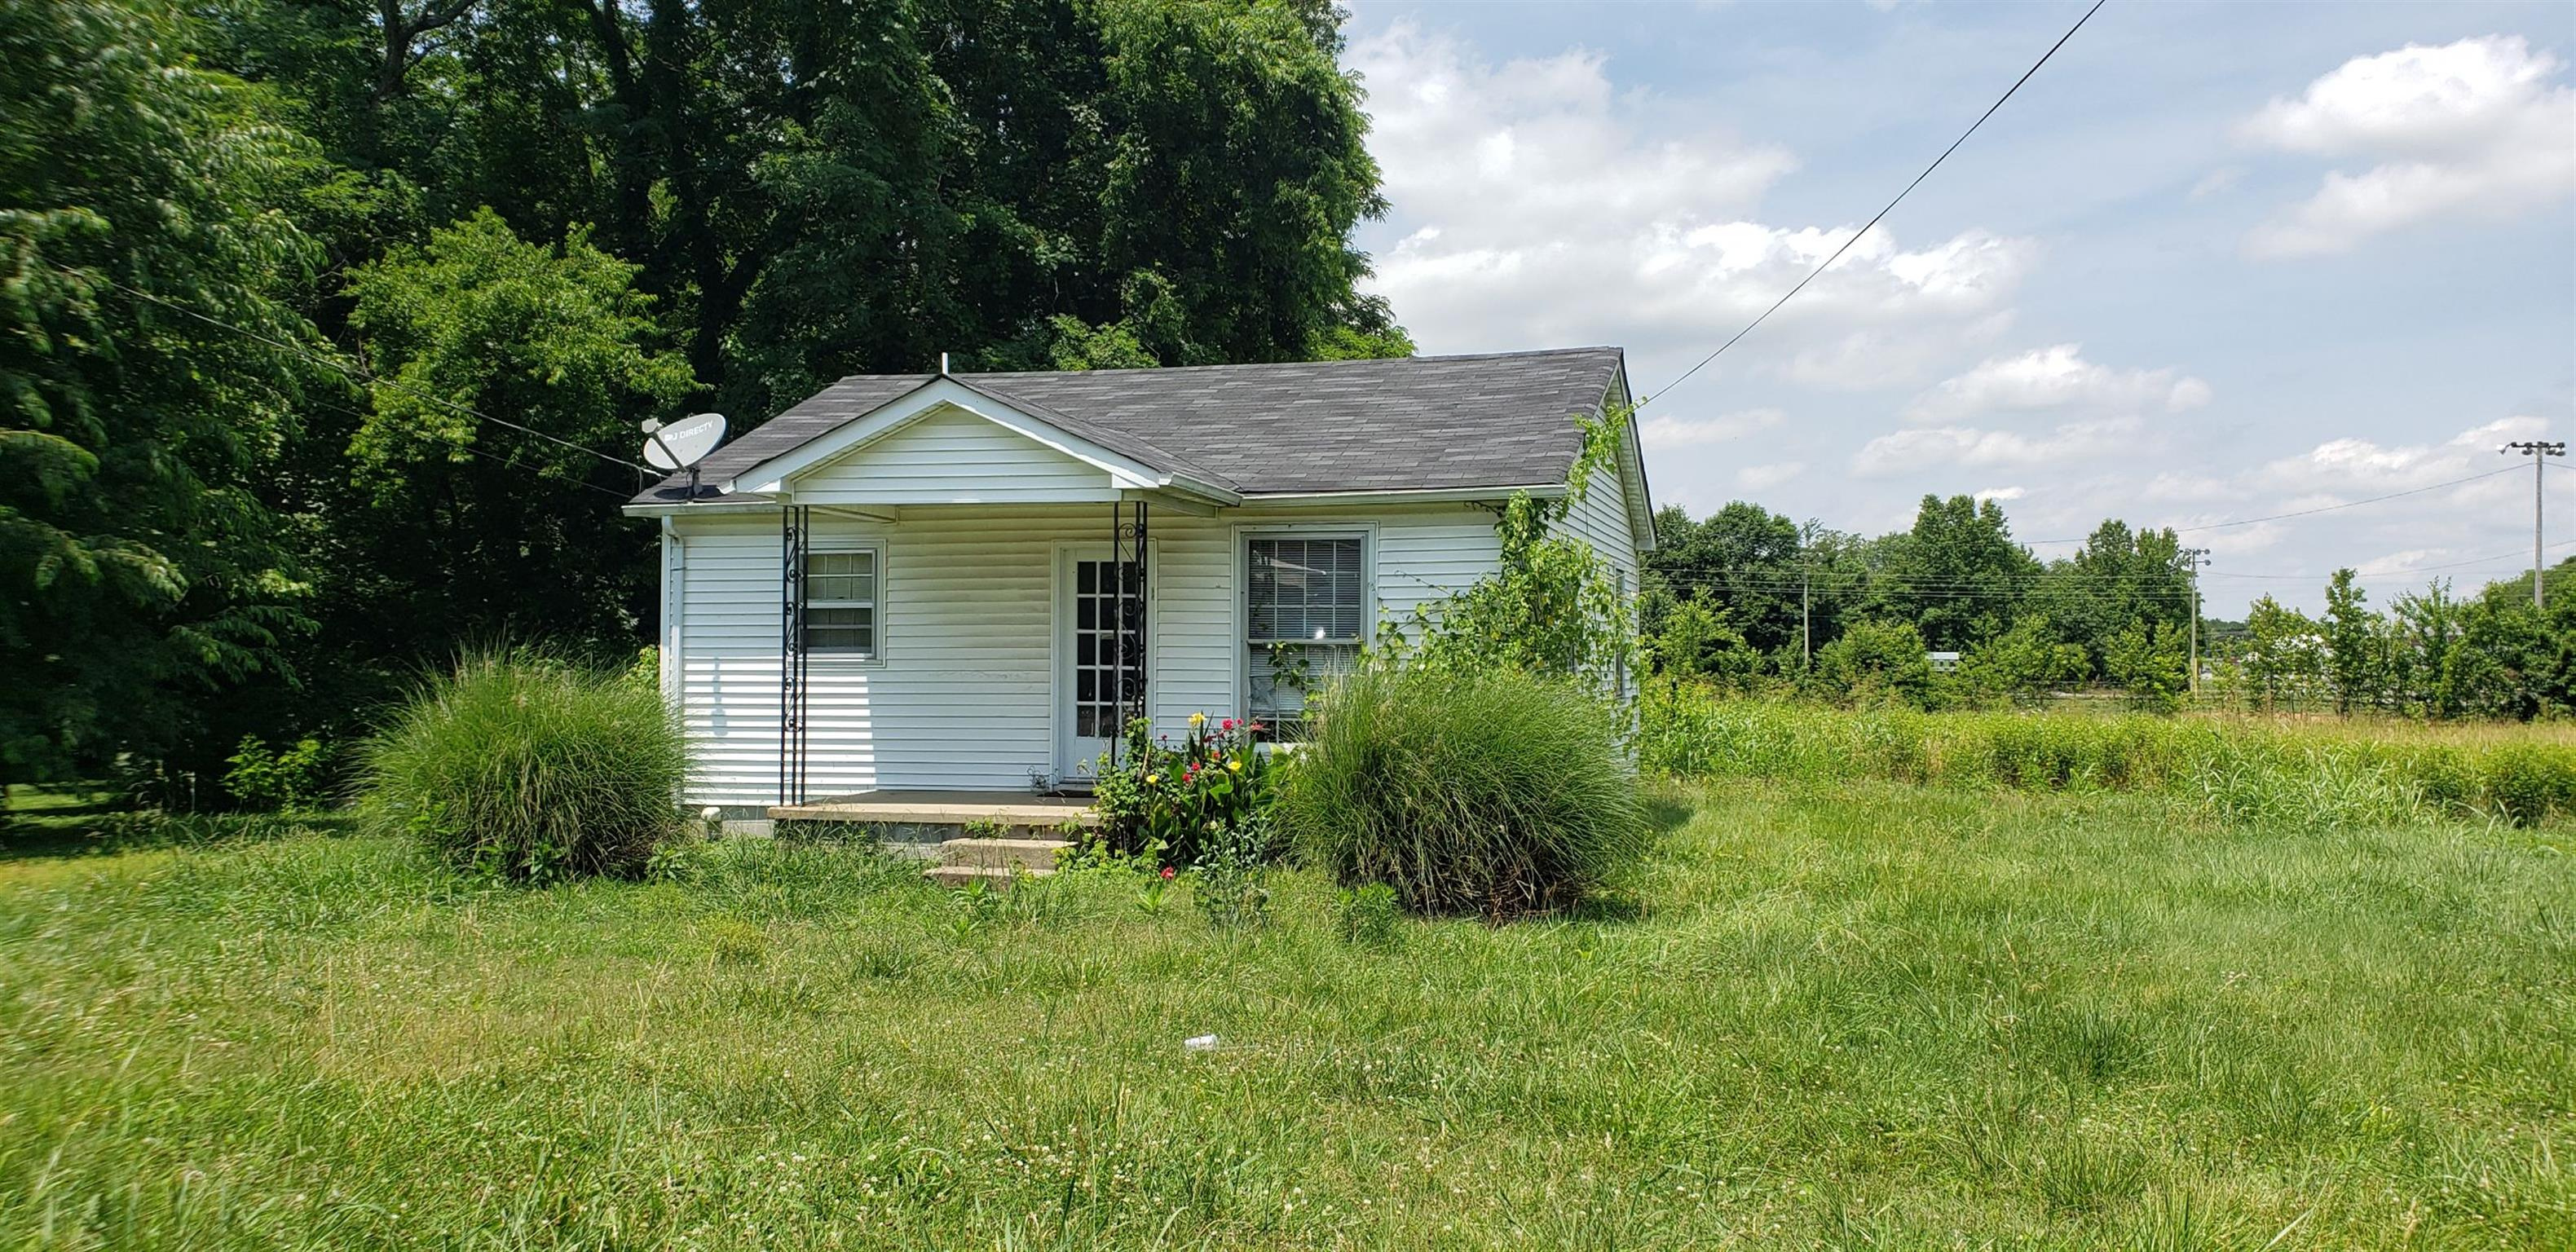 203 Oak St, Portland, TN 37148 - Portland, TN real estate listing